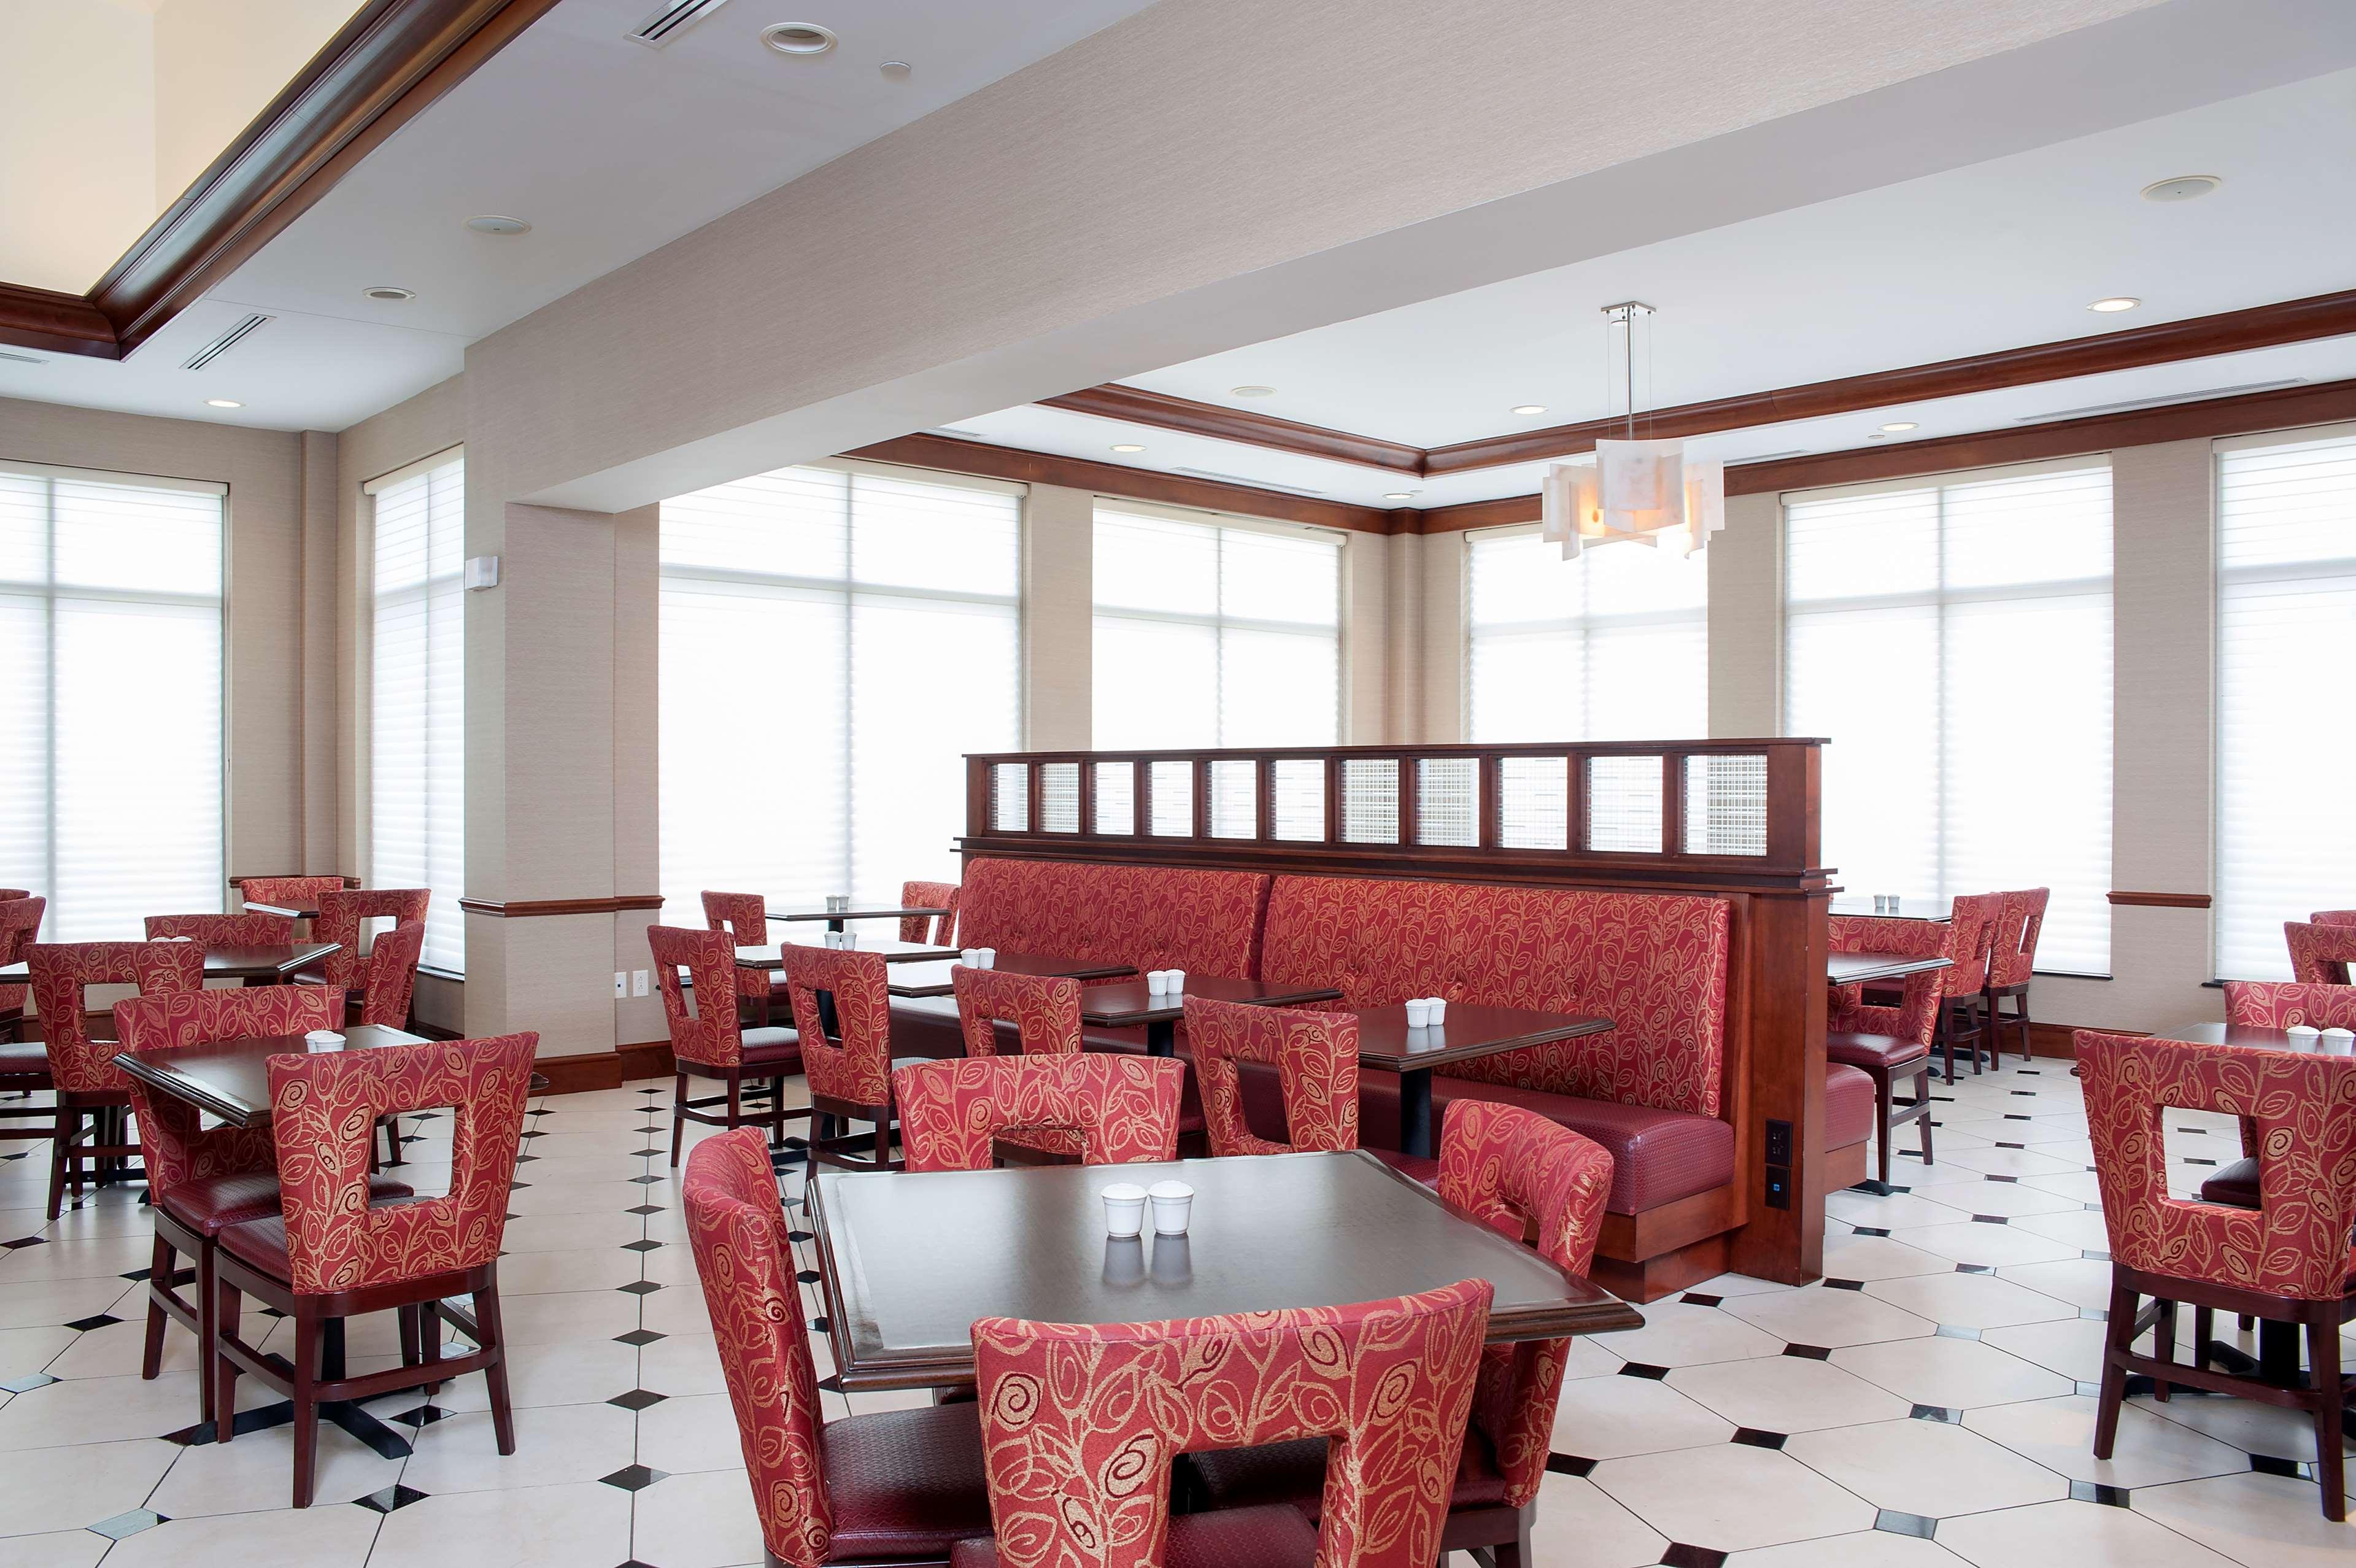 Hilton Garden Inn Indianapolis South/Greenwood image 10